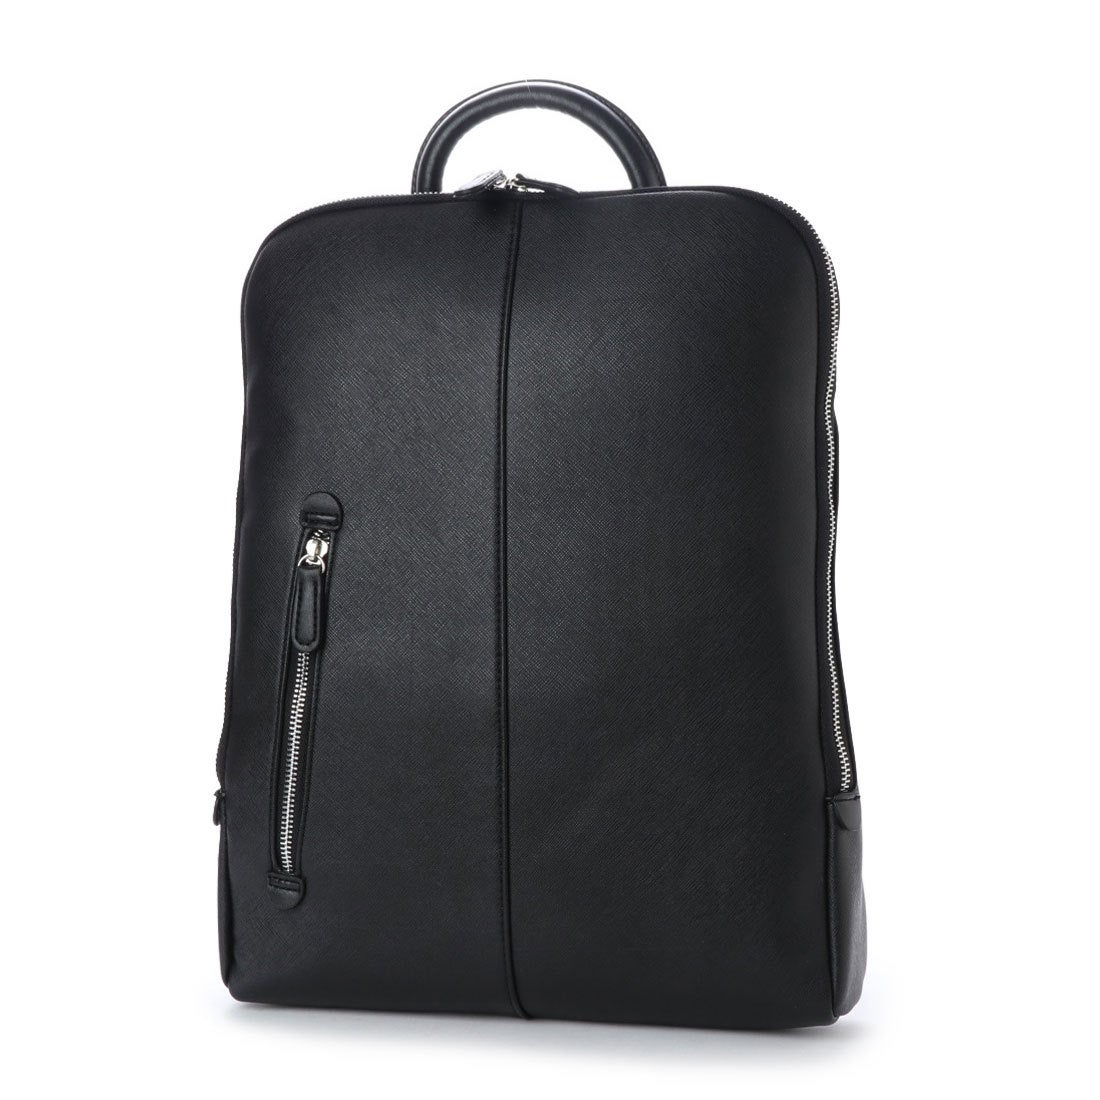 e90c1eaf005c ウノフク UNOFUKU Busitool DOUBLE リュック (ブラック) -靴&ファッション通販 ロコンド〜自宅で試着、気軽に返品